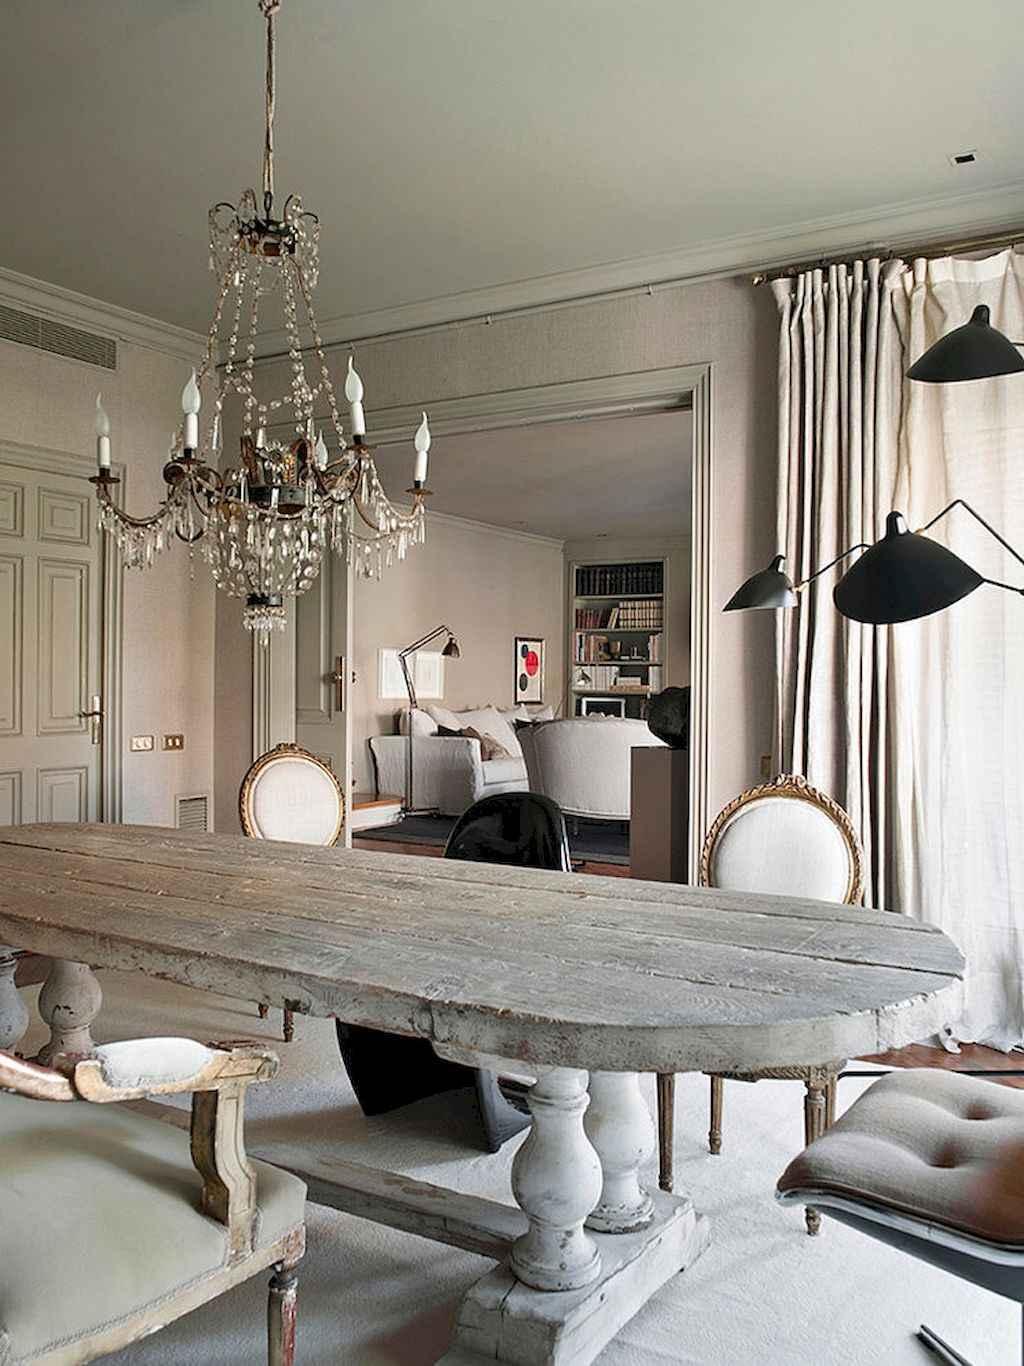 100 Rustic Farmhouse Dining Room Decor Ideas (6)